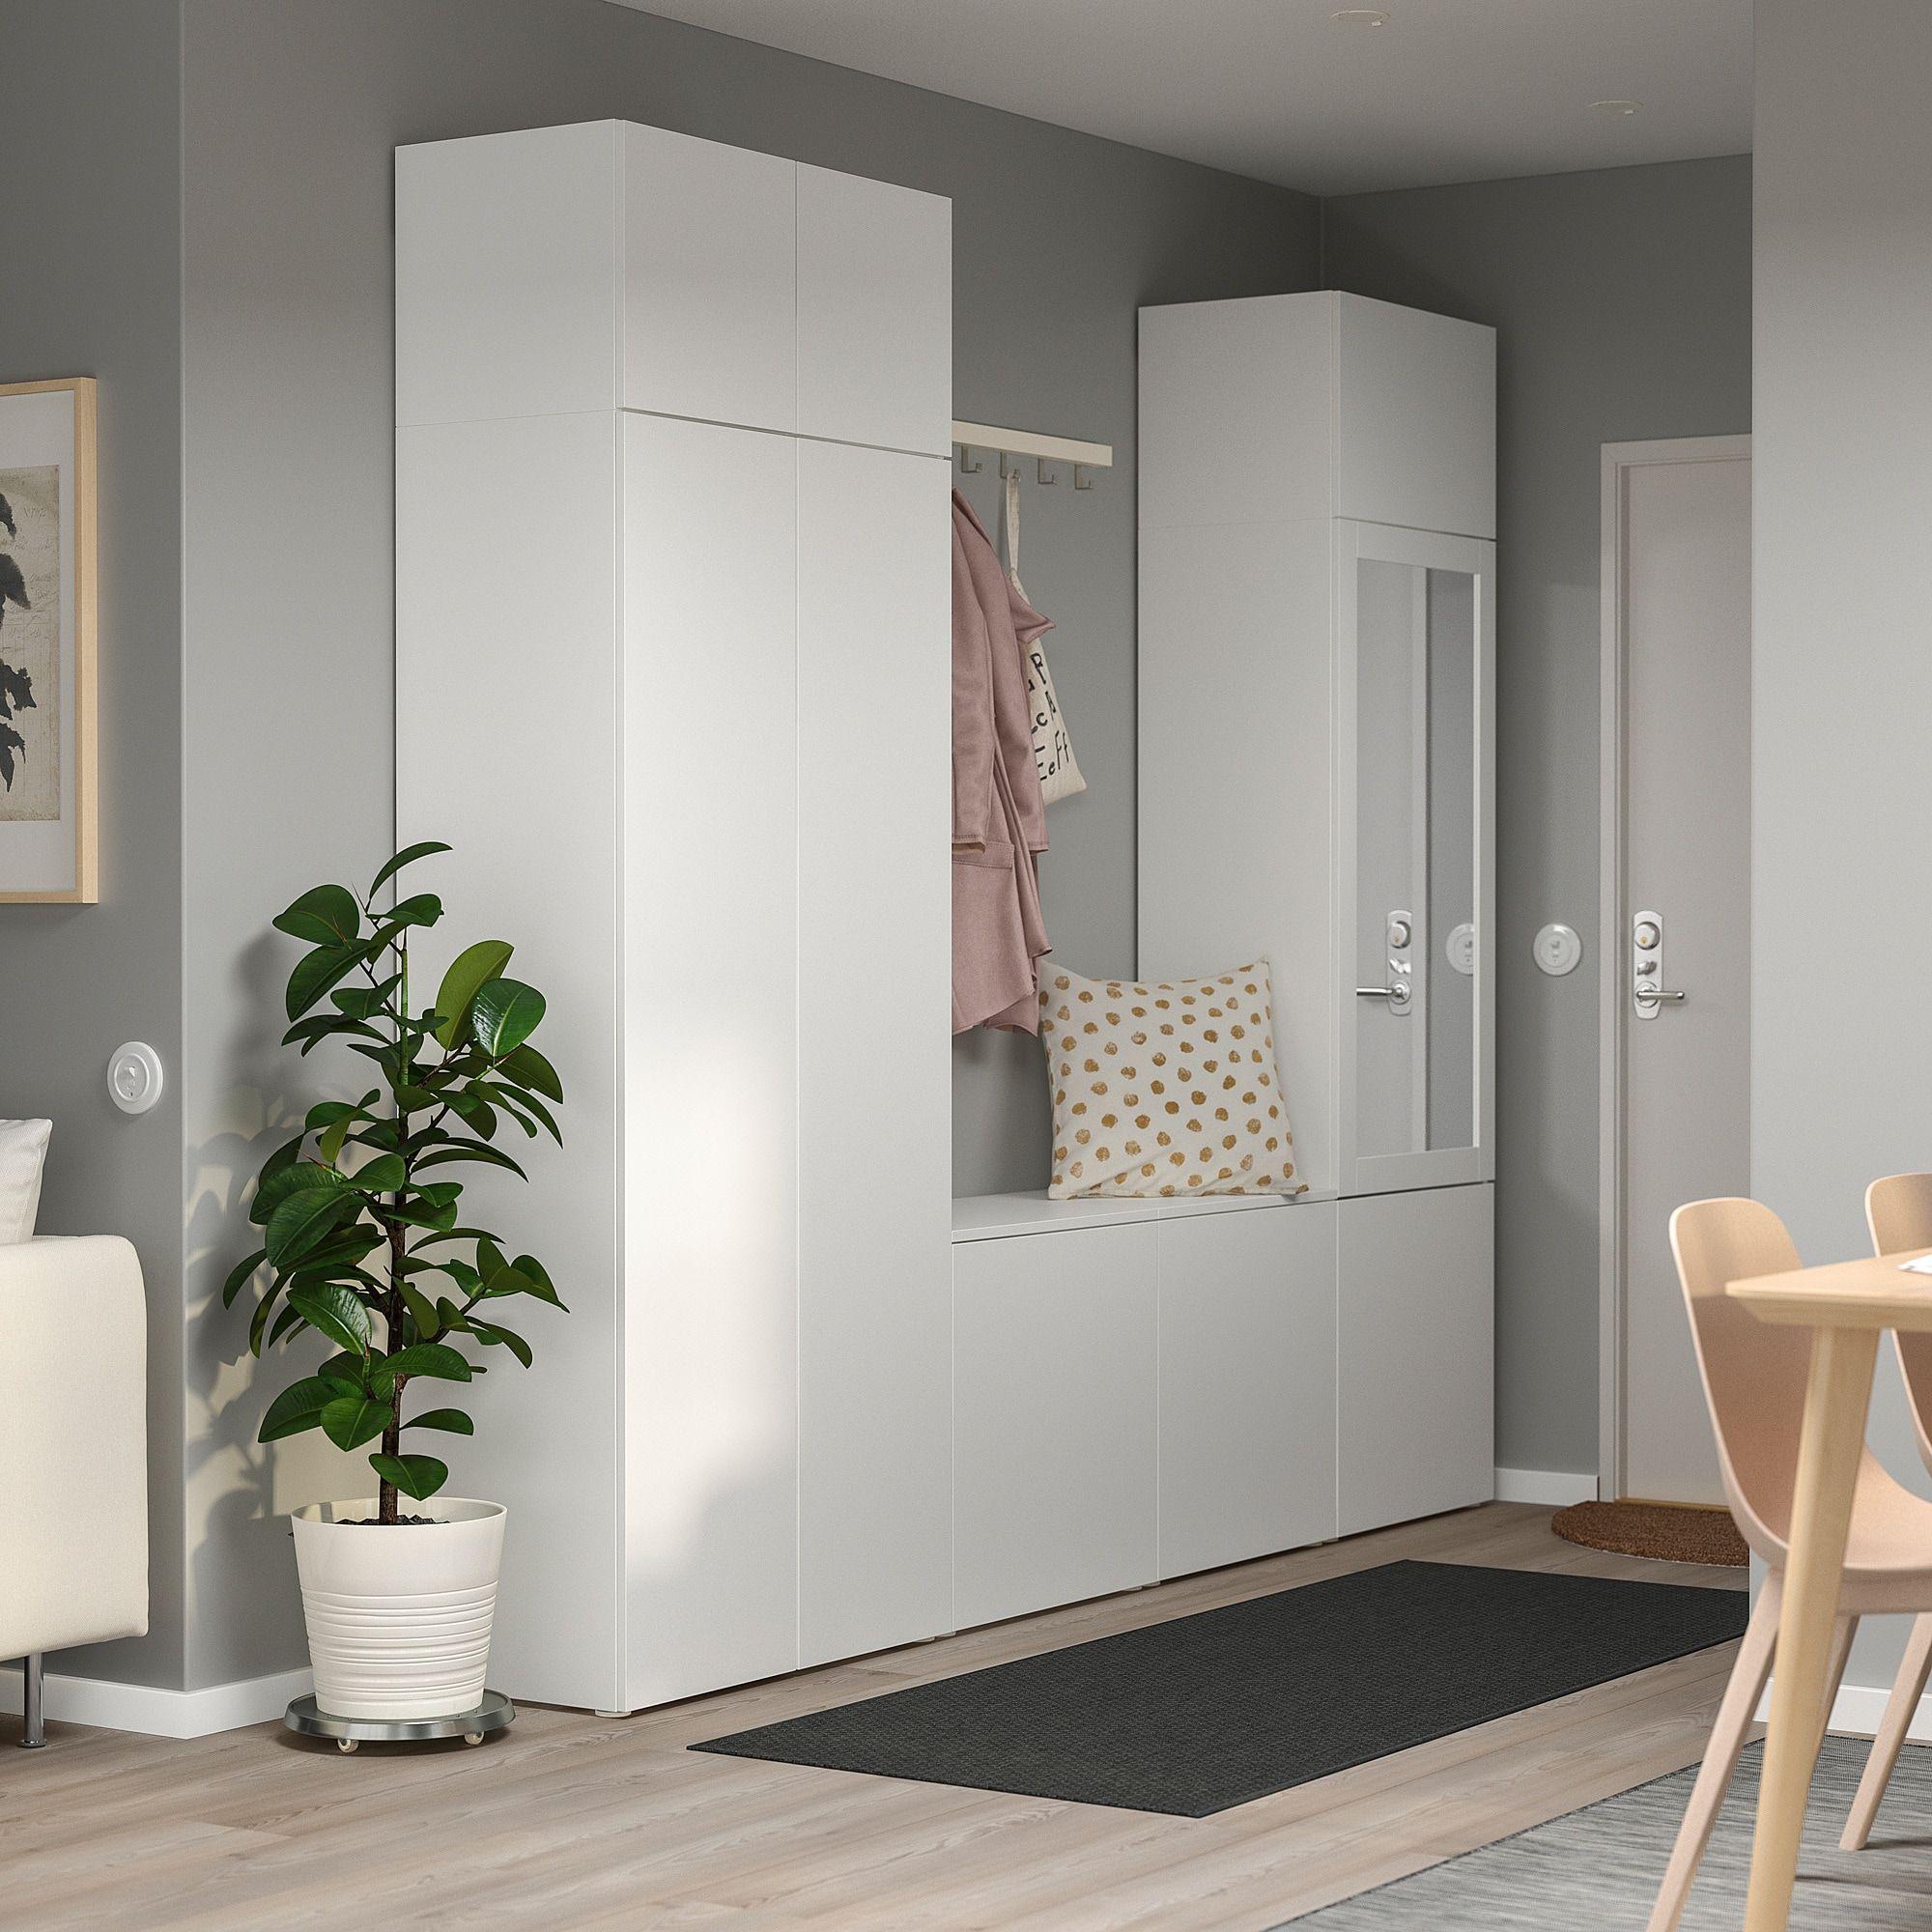 Platsa Kleiderschrank Mit 9 Turen Weiss Fonnes Ridabu Ikea Flureinrichten Kleiderschrank Weiss Wohnung Mobel Ikea Inspiration